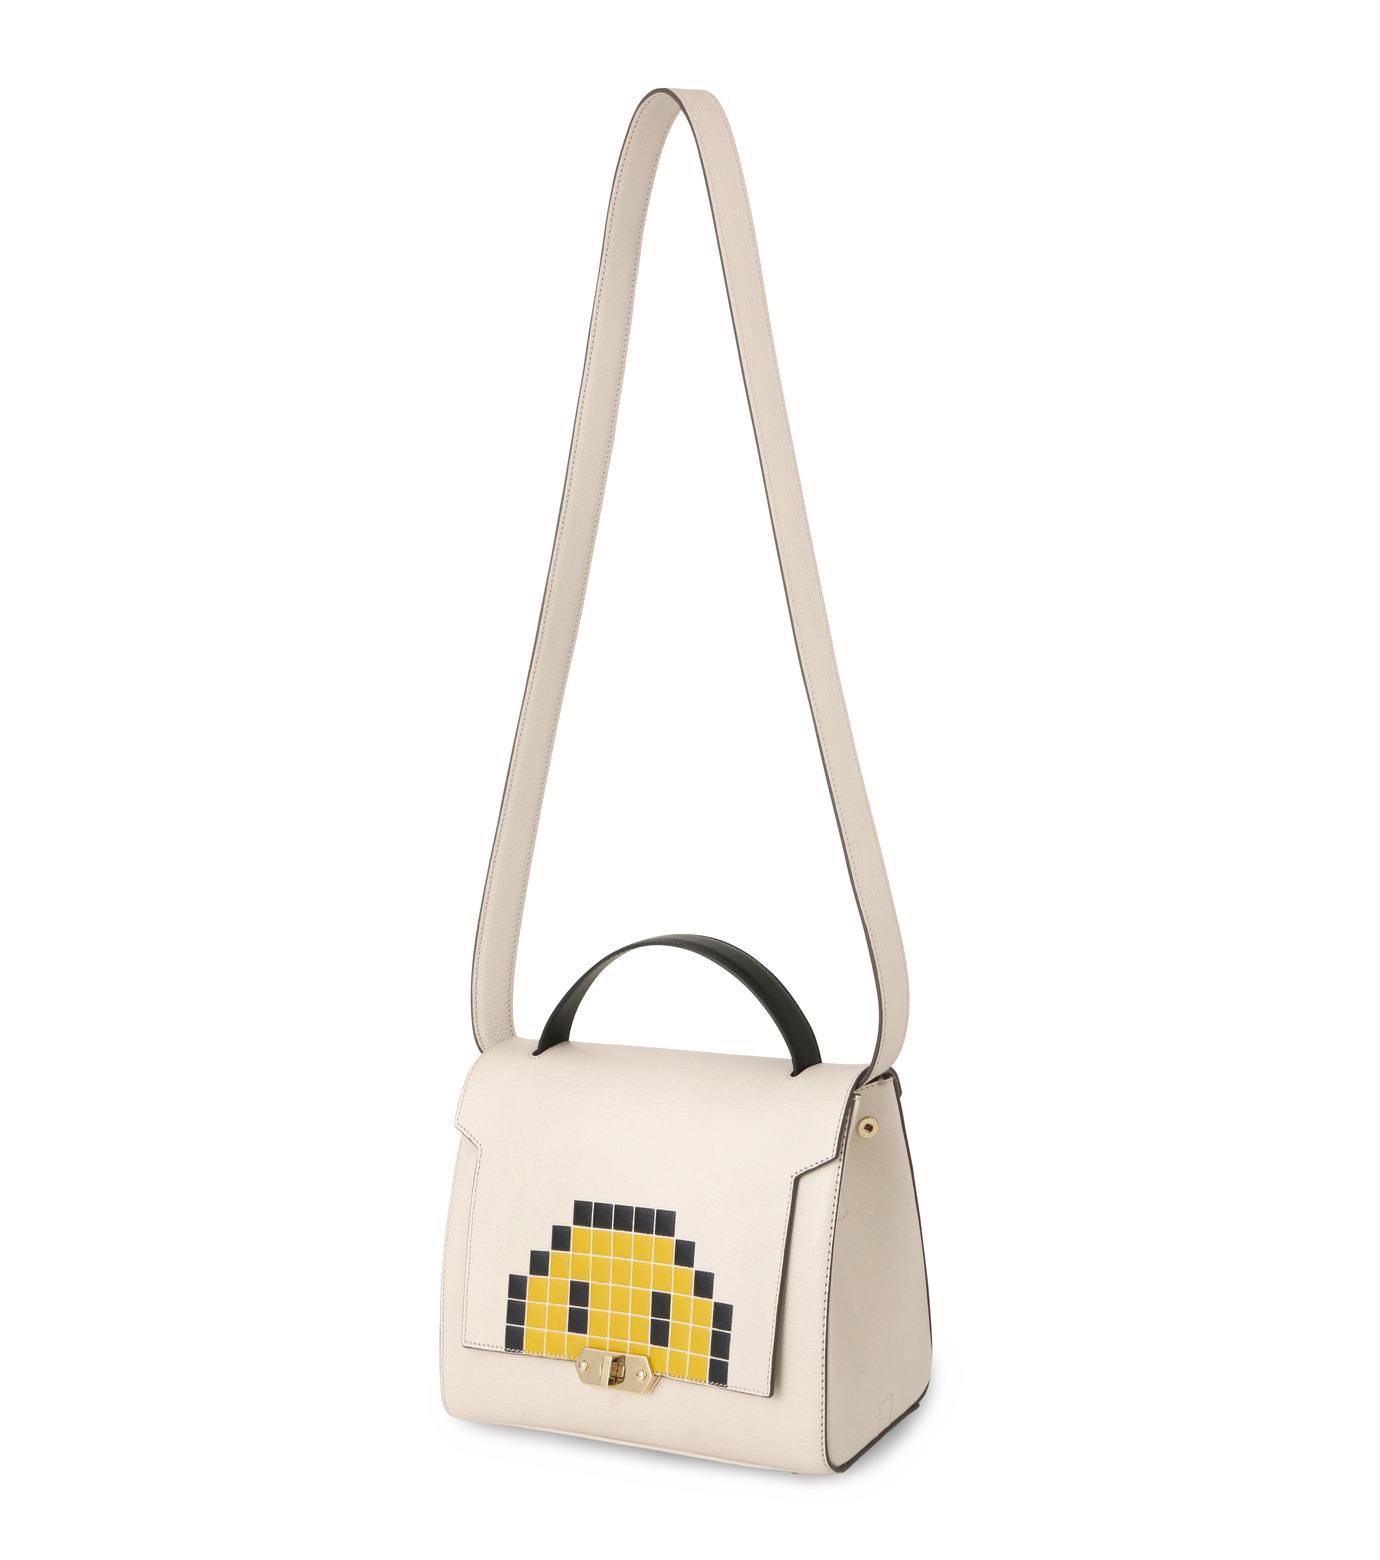 Anya Hindmarch(アニヤハインドマーチ)のBathurst Small Satchel Pixel Smiley-WHITE(ハンドバッグ/hand bag)-923248-5 拡大詳細画像2